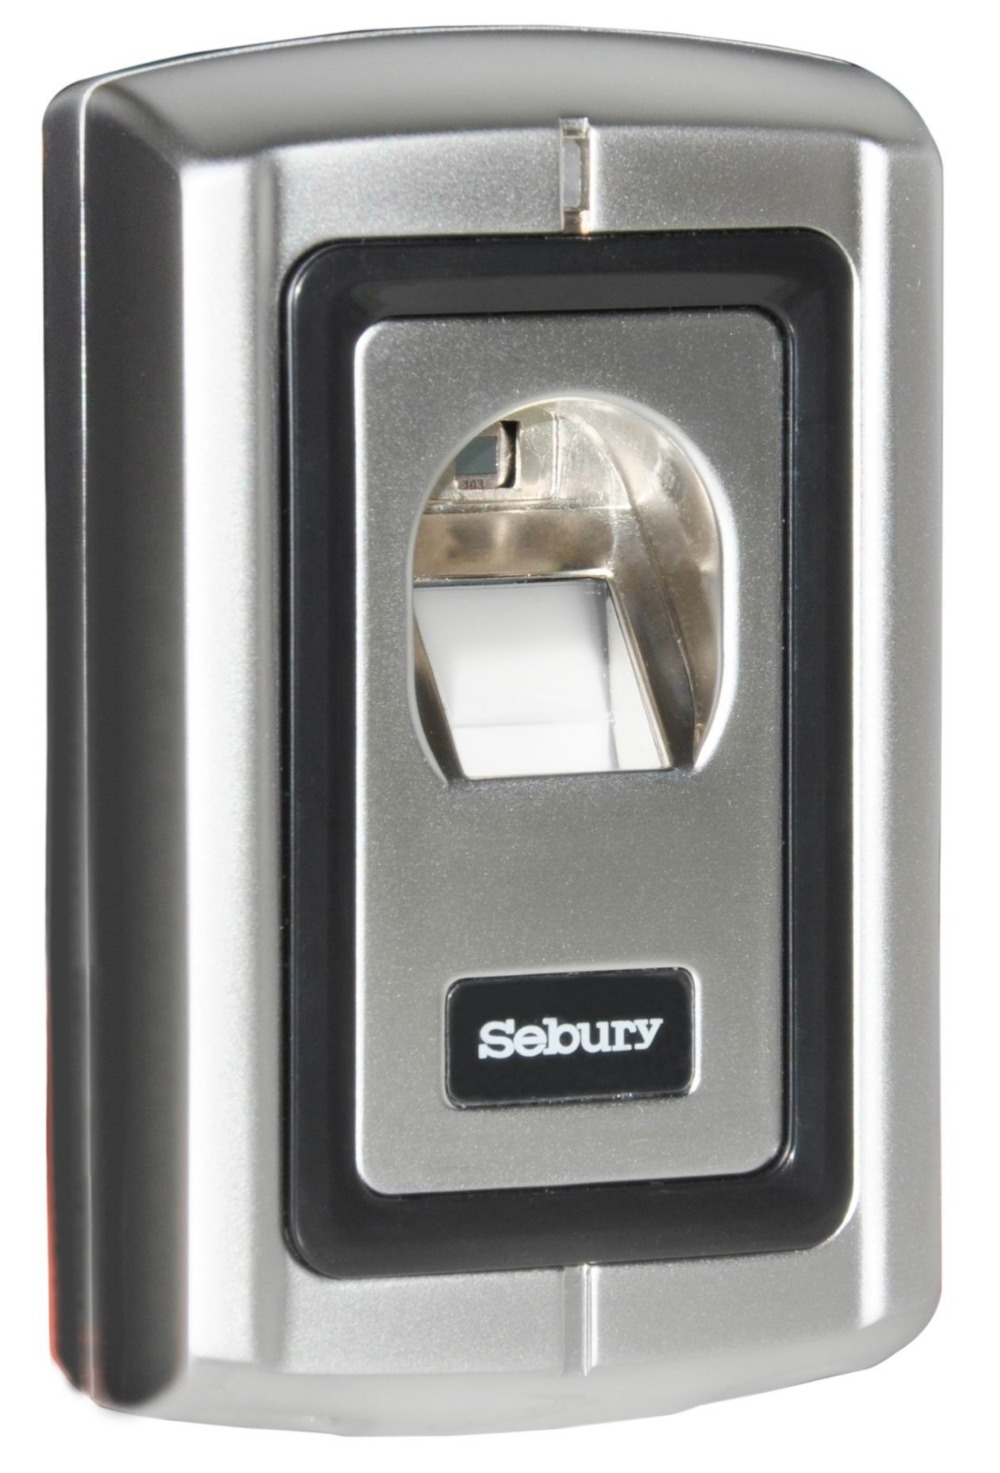 Sebury F007 Metal Case Anti-Vandal Biometric Fingerprint Access Control Reader